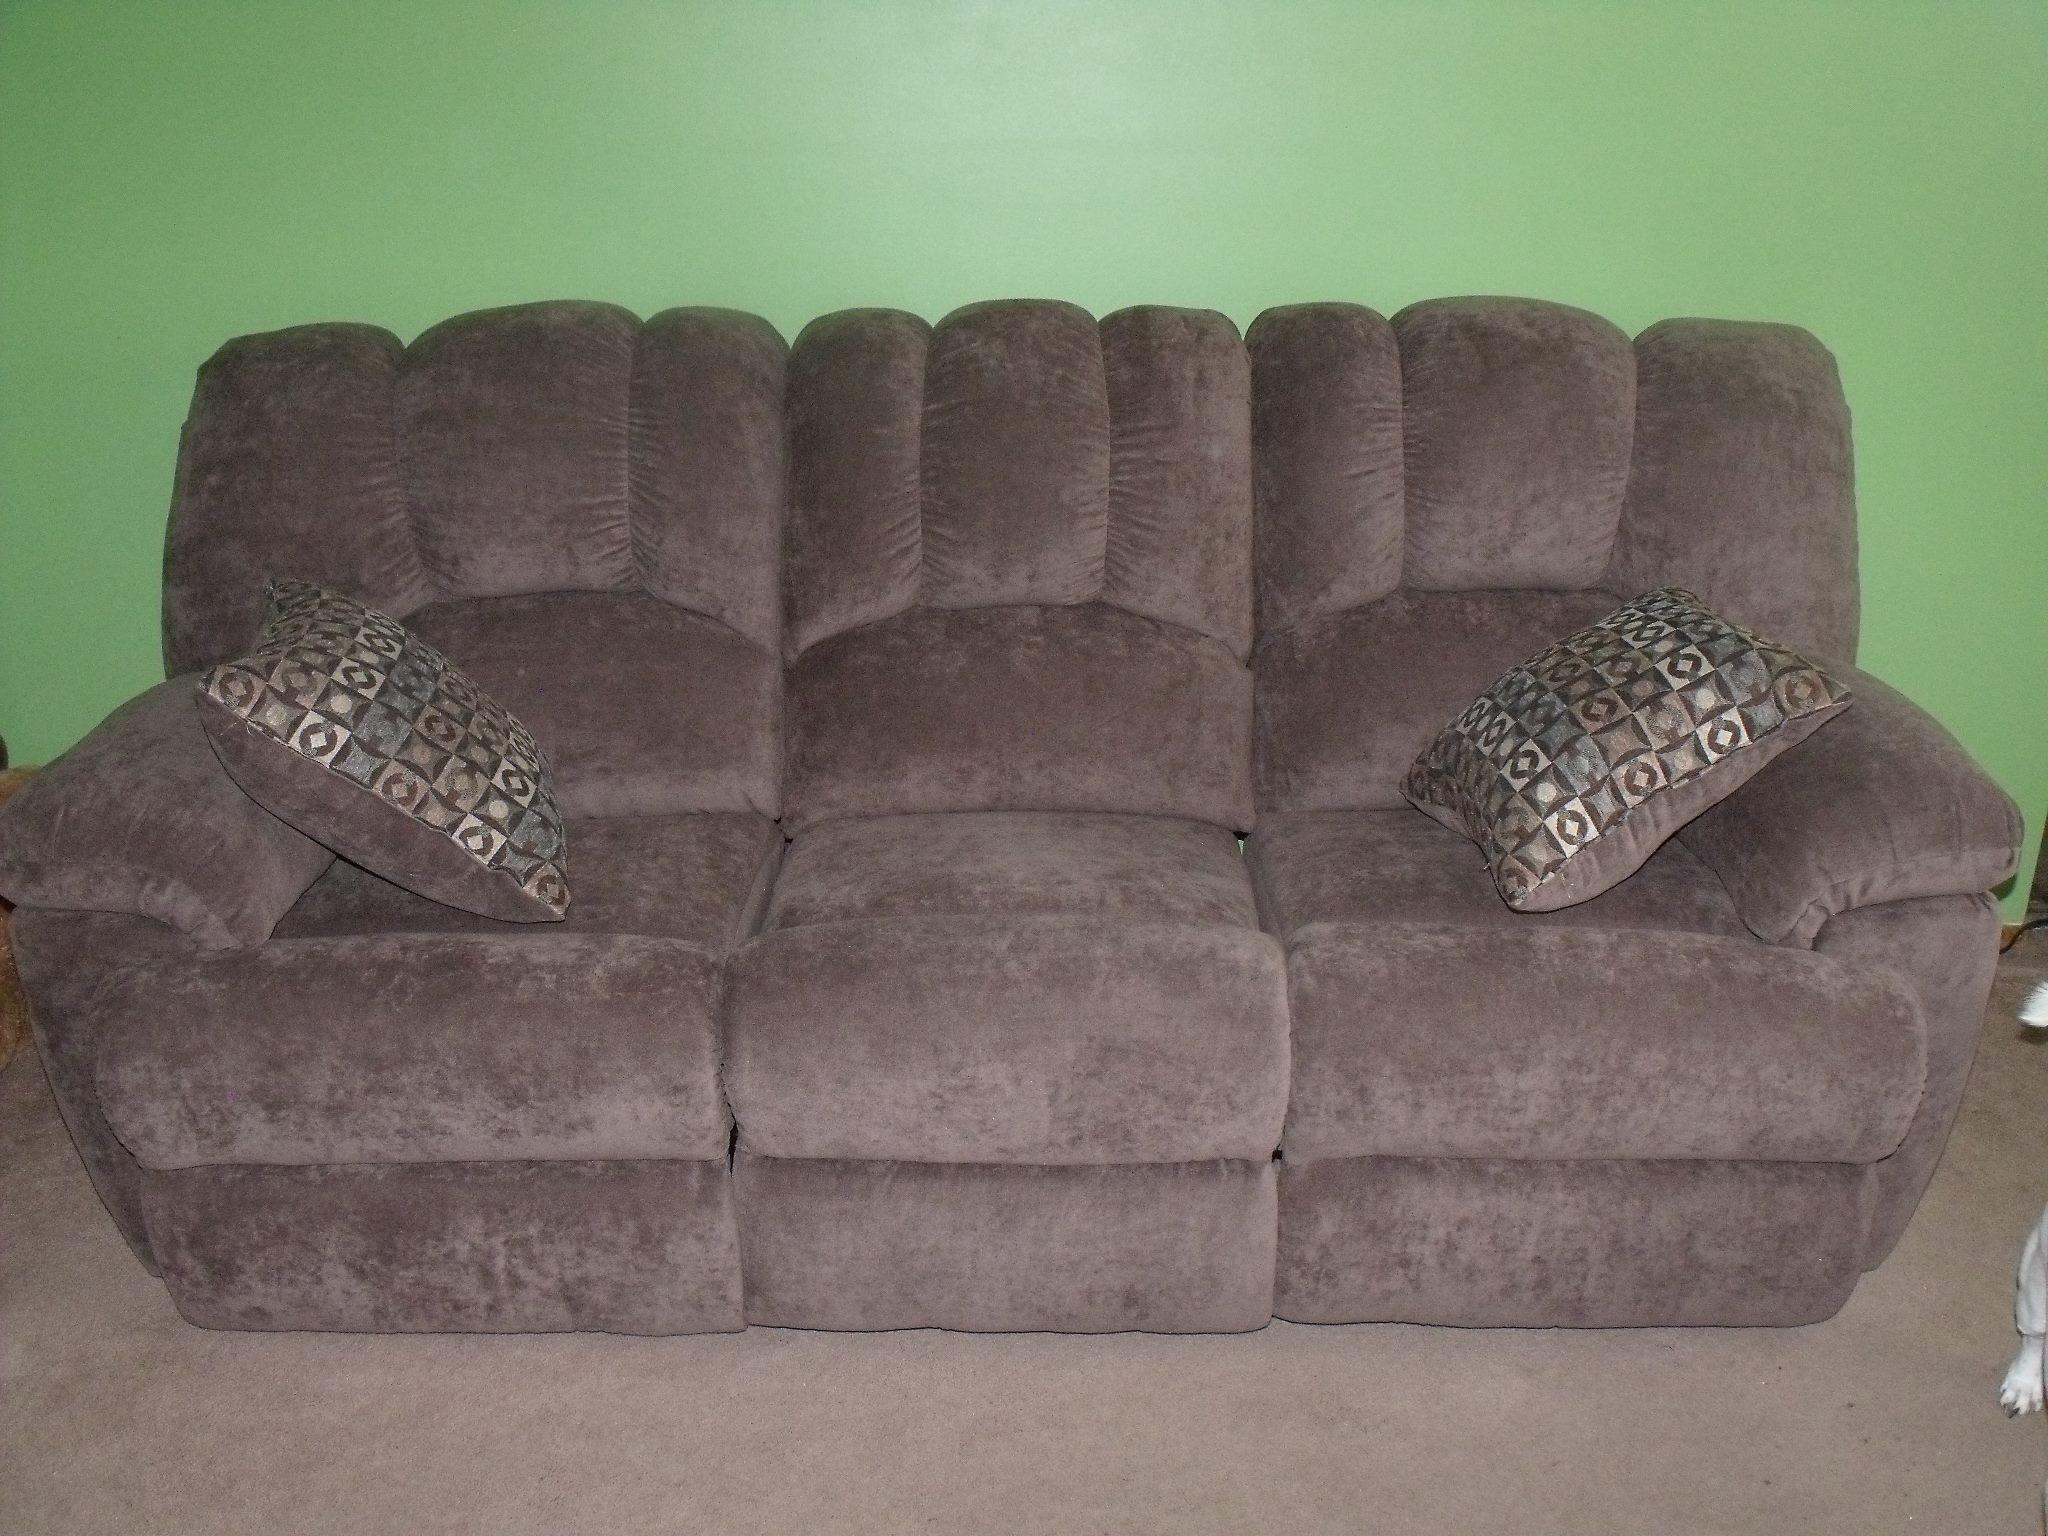 Gardner White Furniture Official Site Home Design Ideas